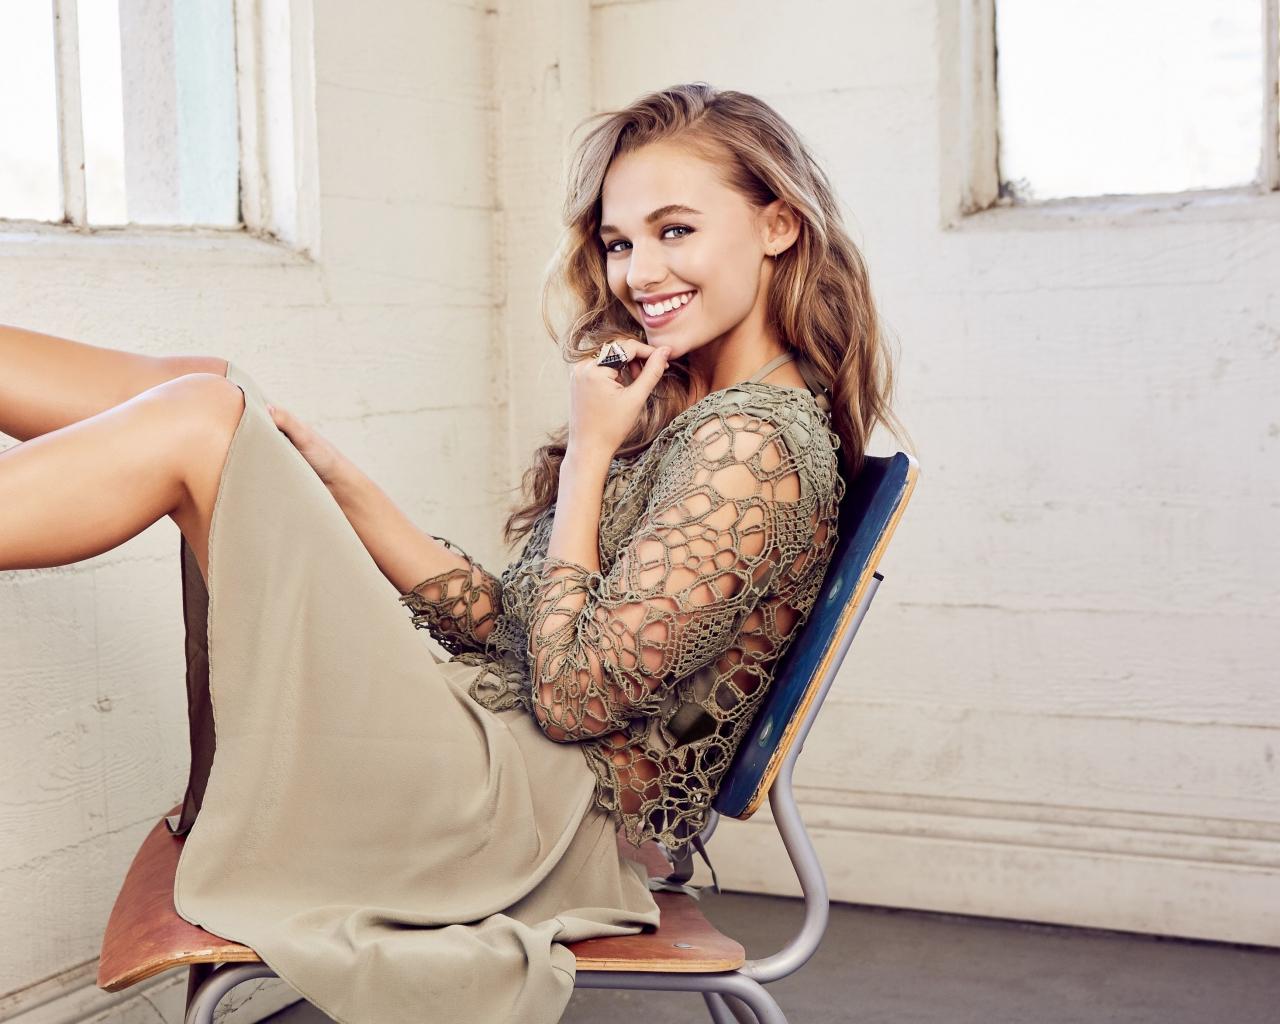 Madison Iseman, actress, smile, 2019, 1280x1024 wallpaper